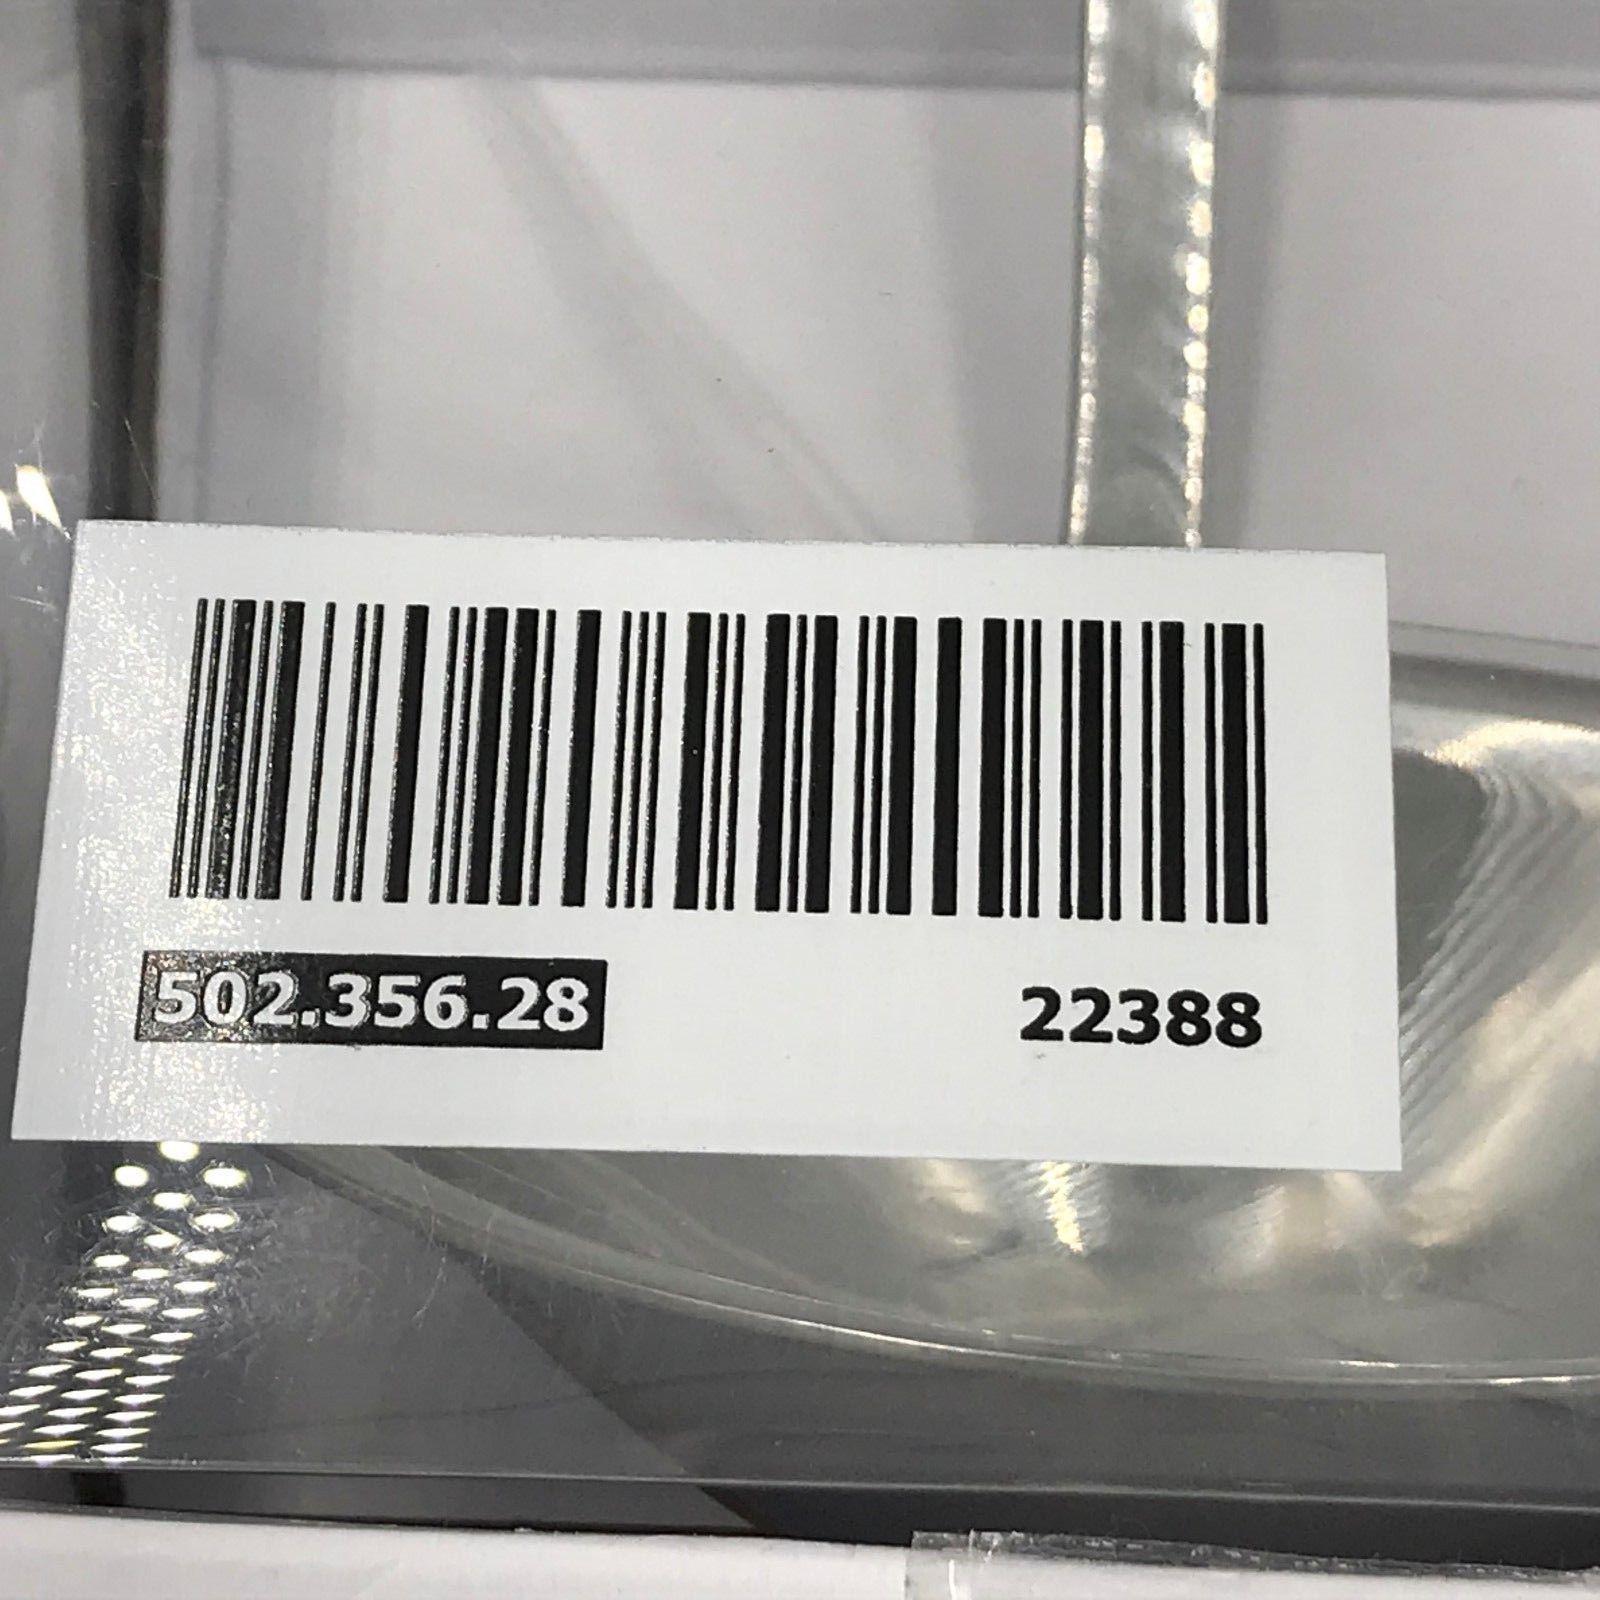 "IKEA Dragon Soup Ladle Stainless Steel 11"" New NIP 50235628 UT"